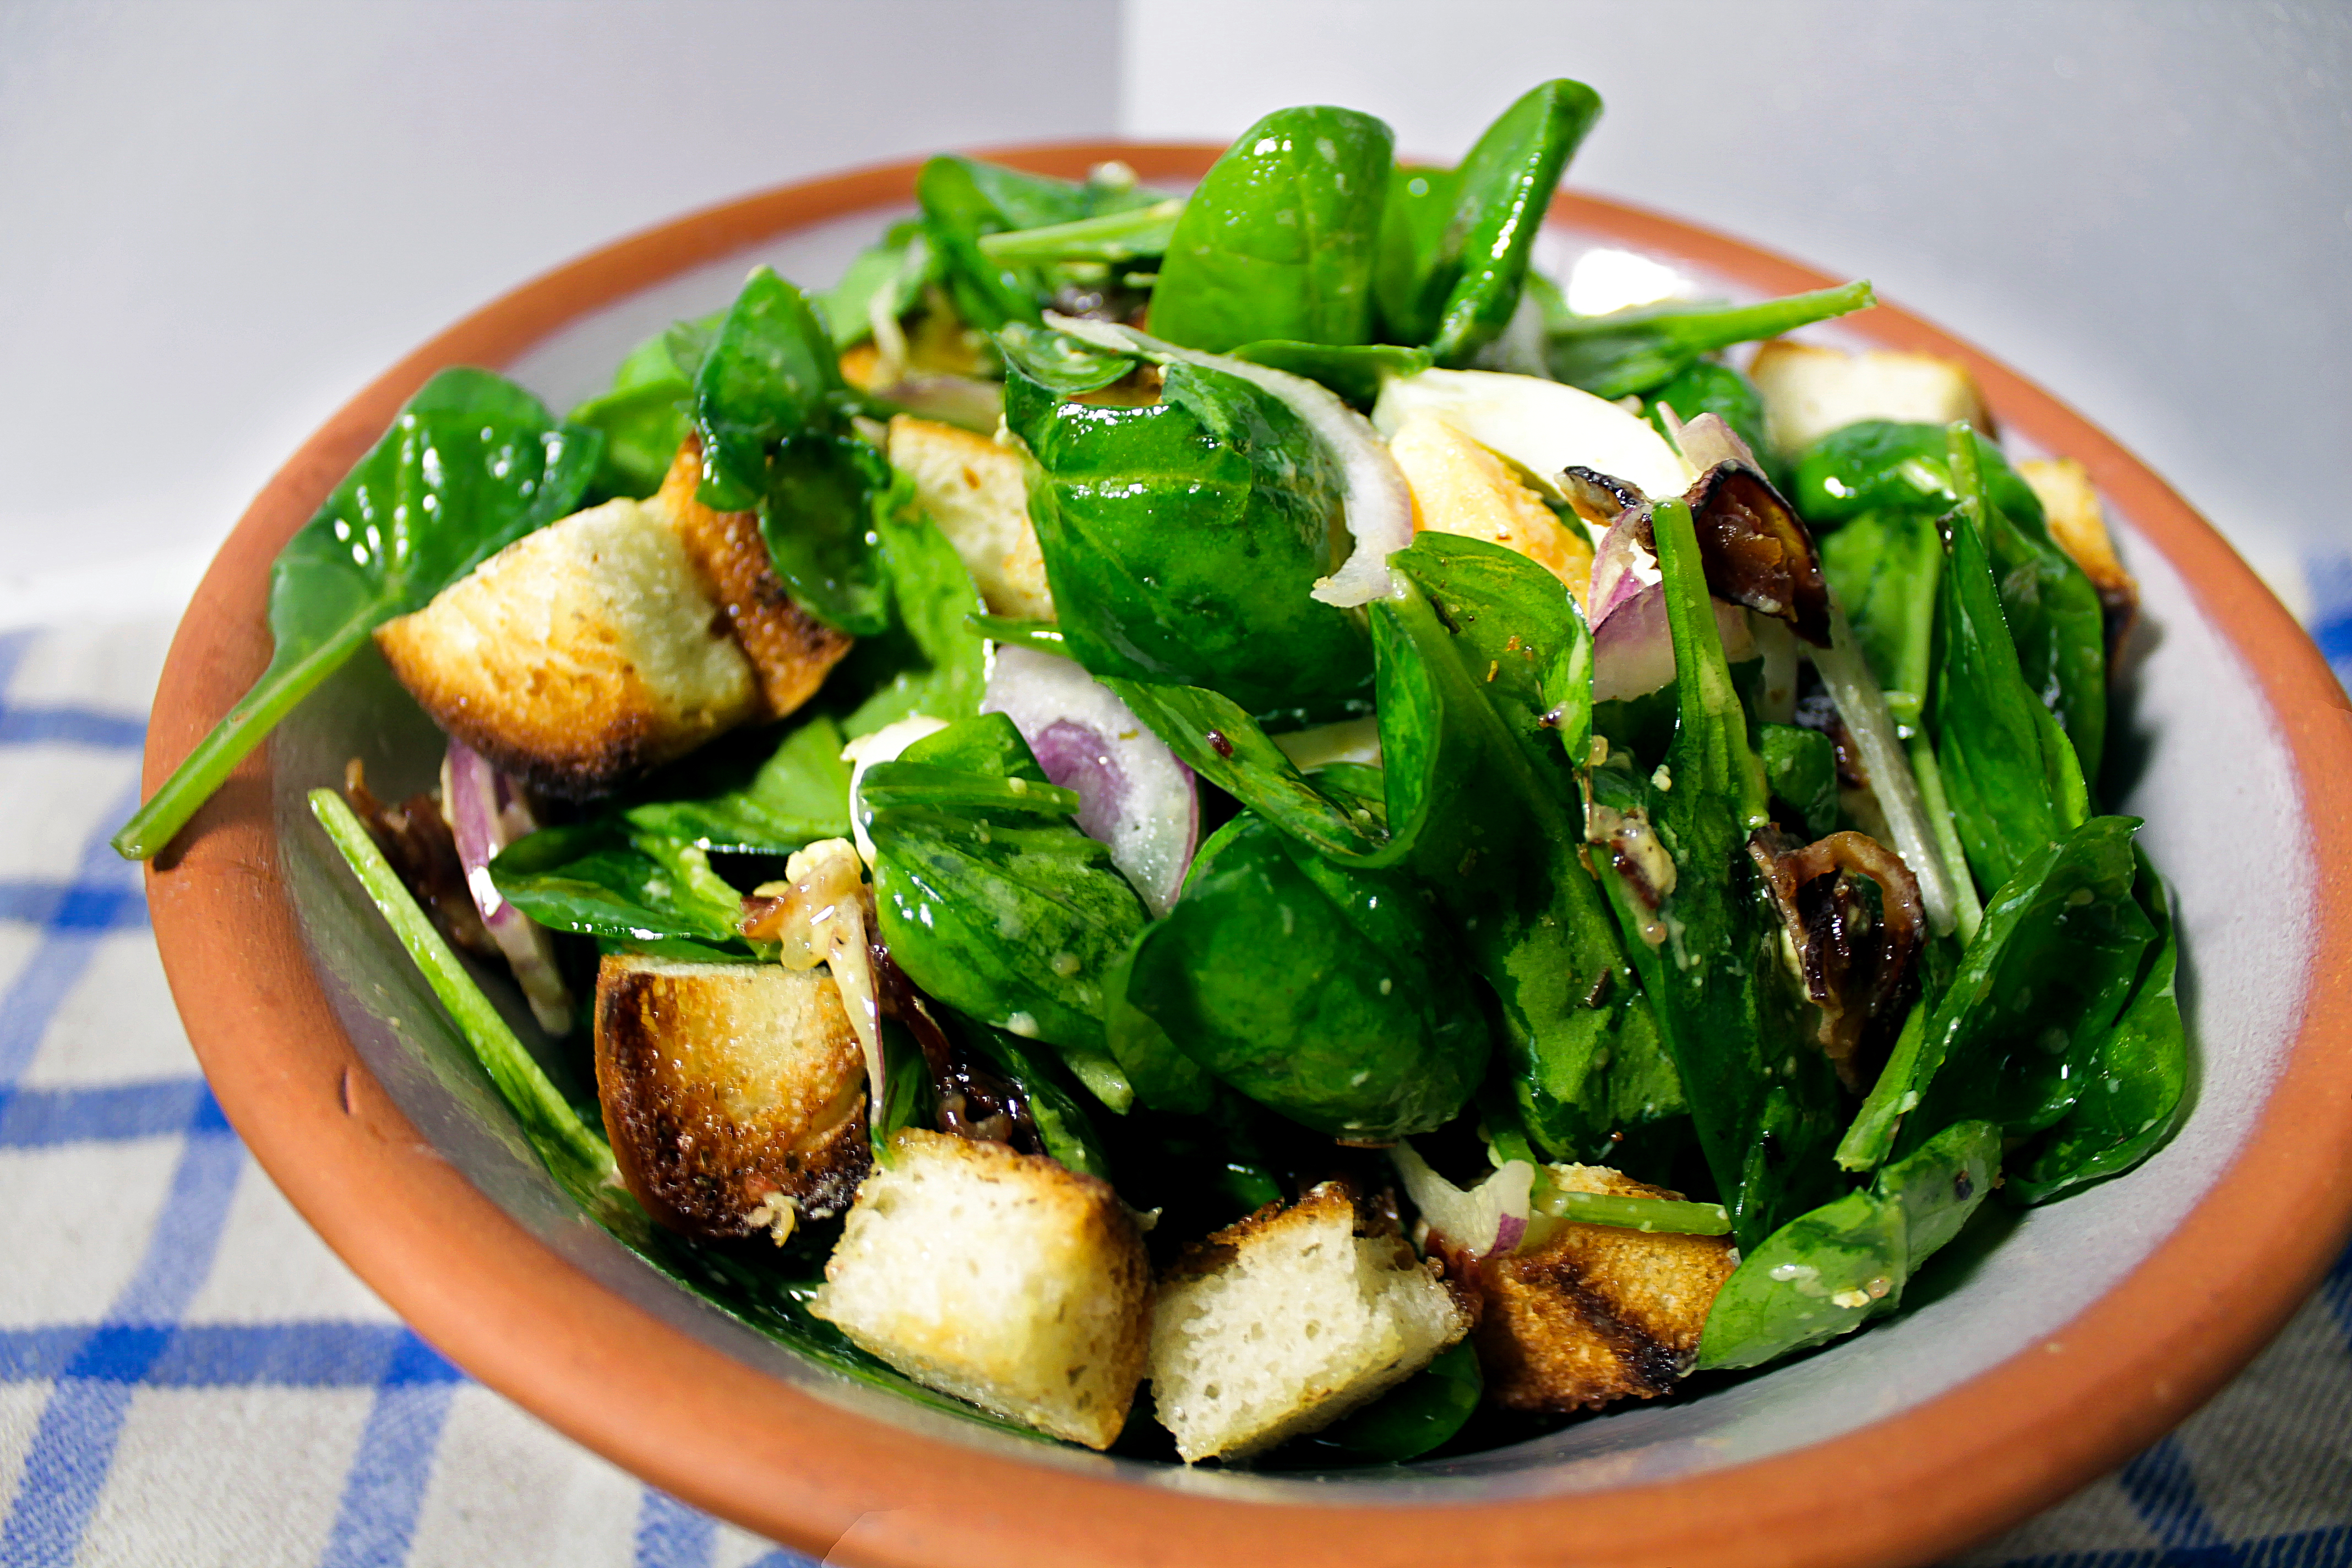 Špinatų salotos su traškia šonine